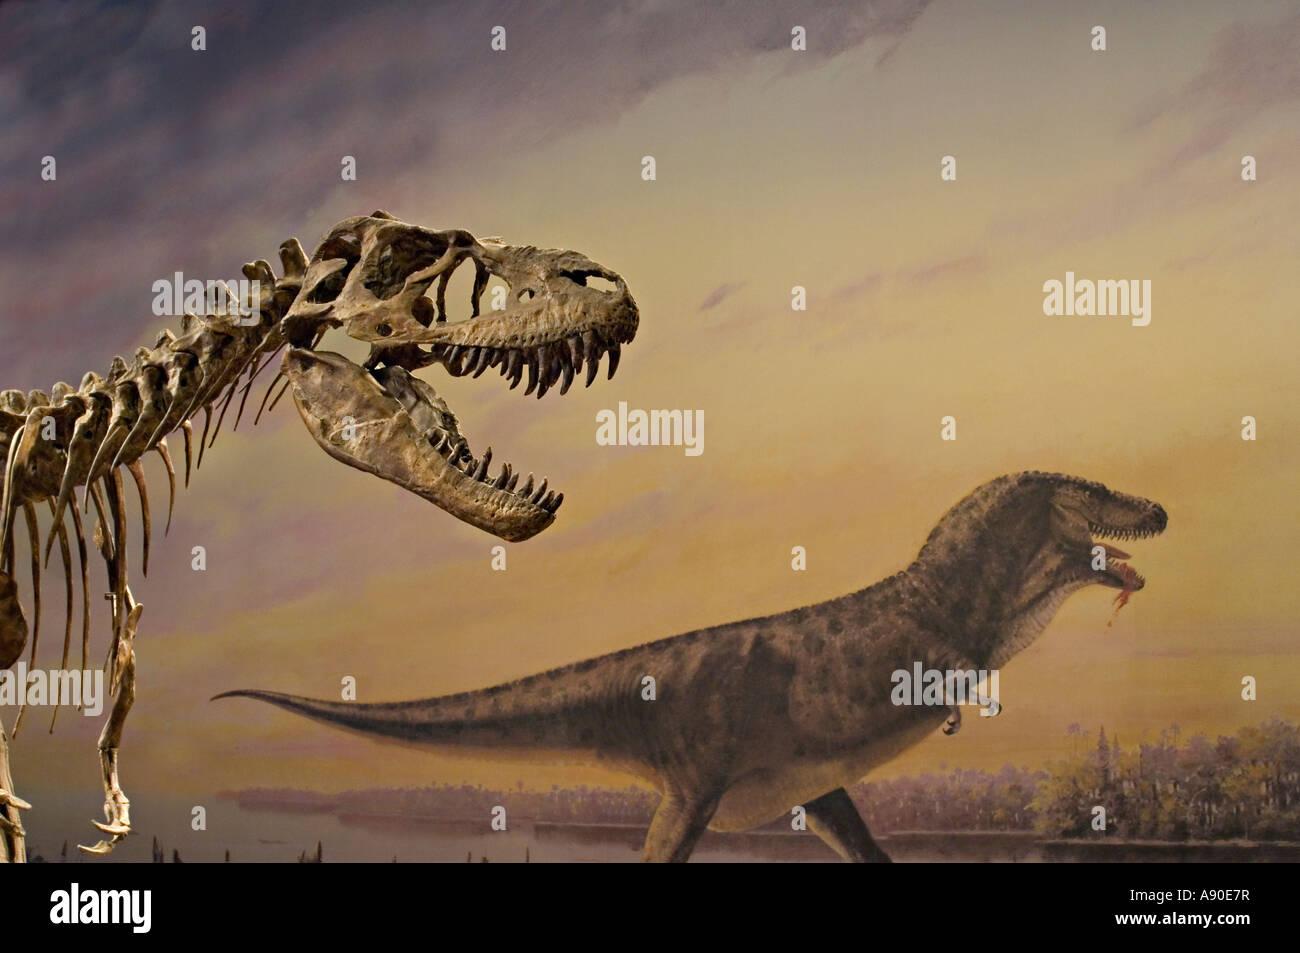 Albertosaurus dinosaur skeleton exhibit - Stock Image